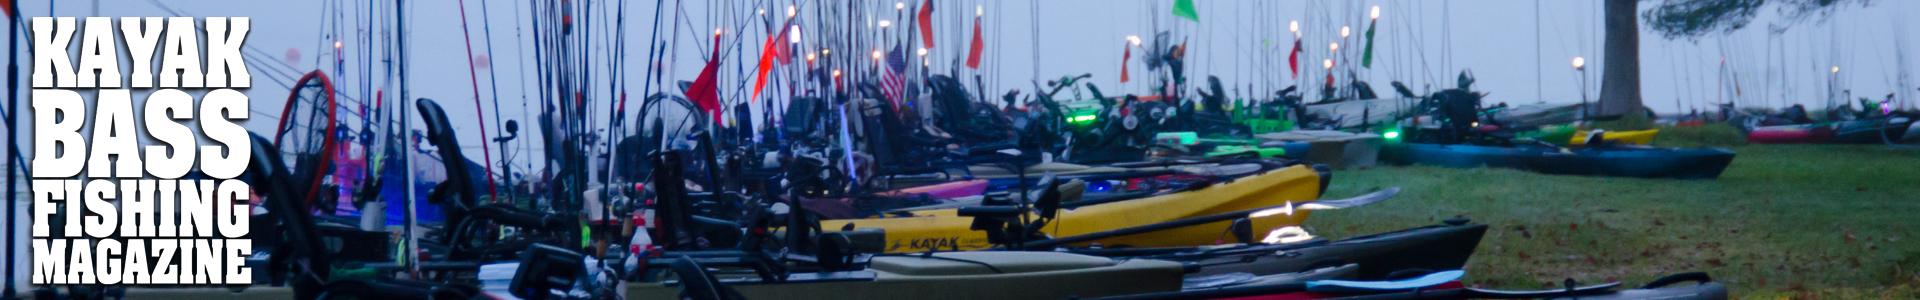 Become a Kayak Bass Fishing Insider